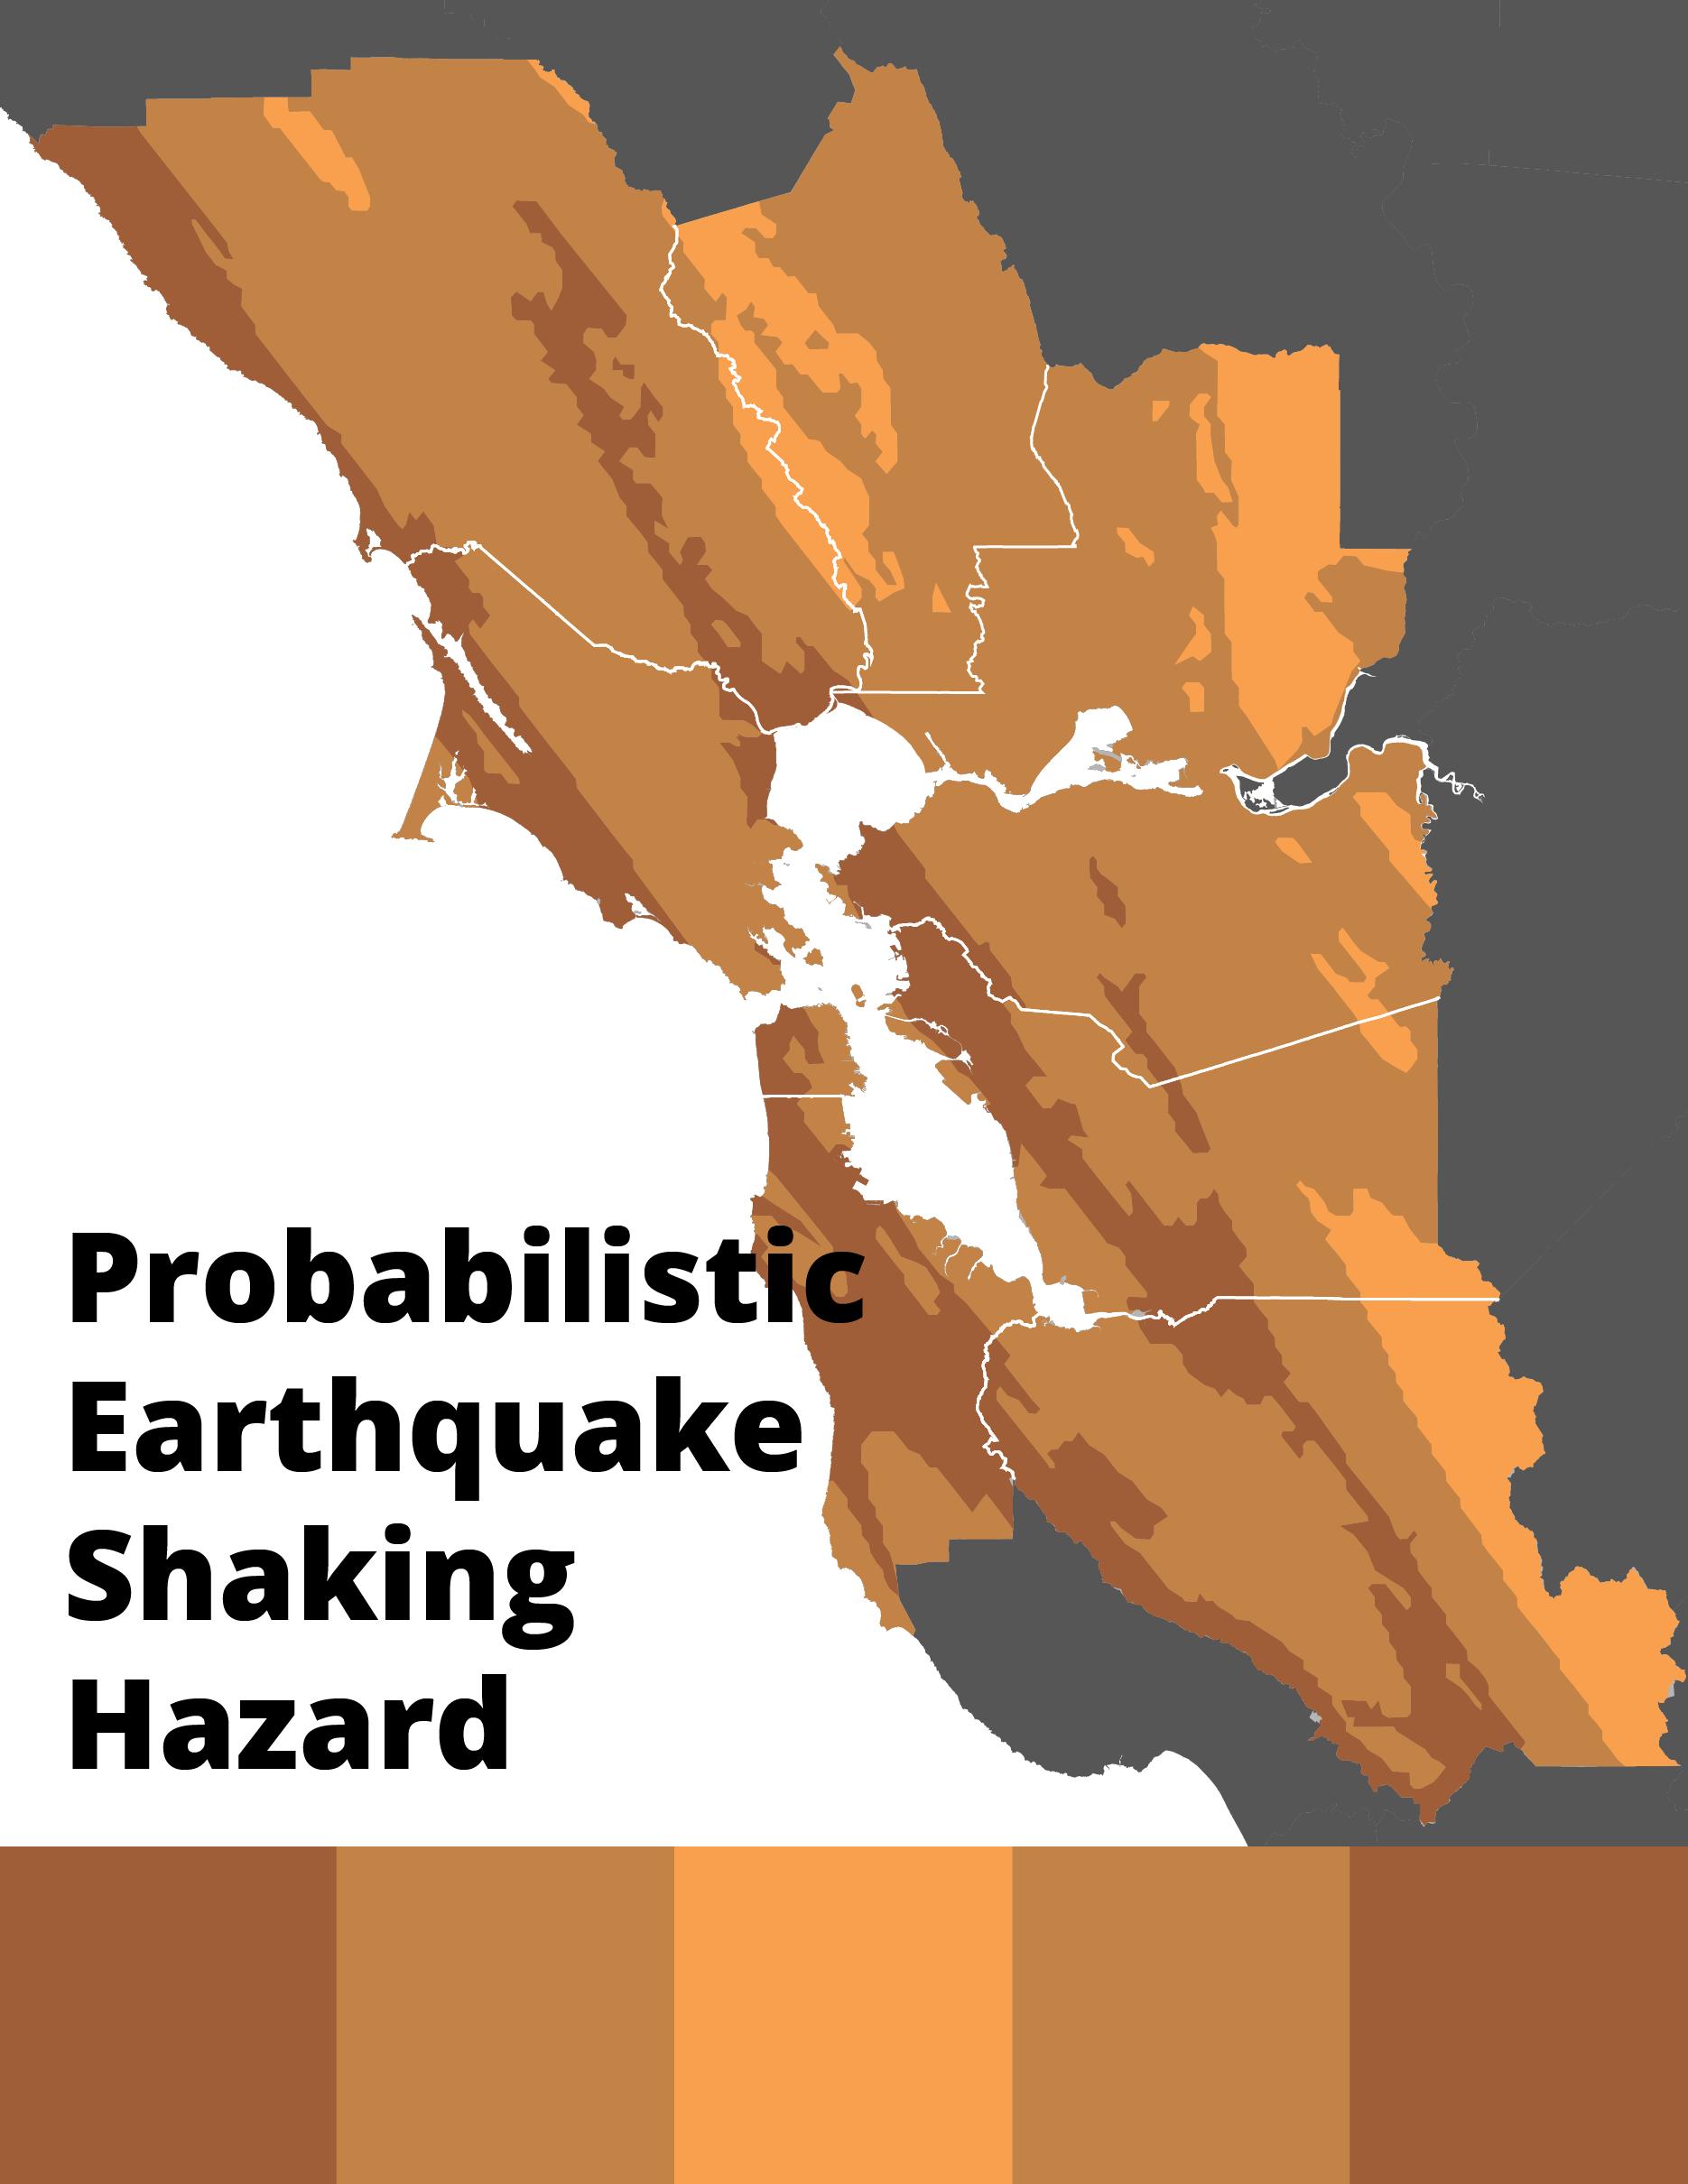 Probabilistic Earthquake Shaking Hazard Map